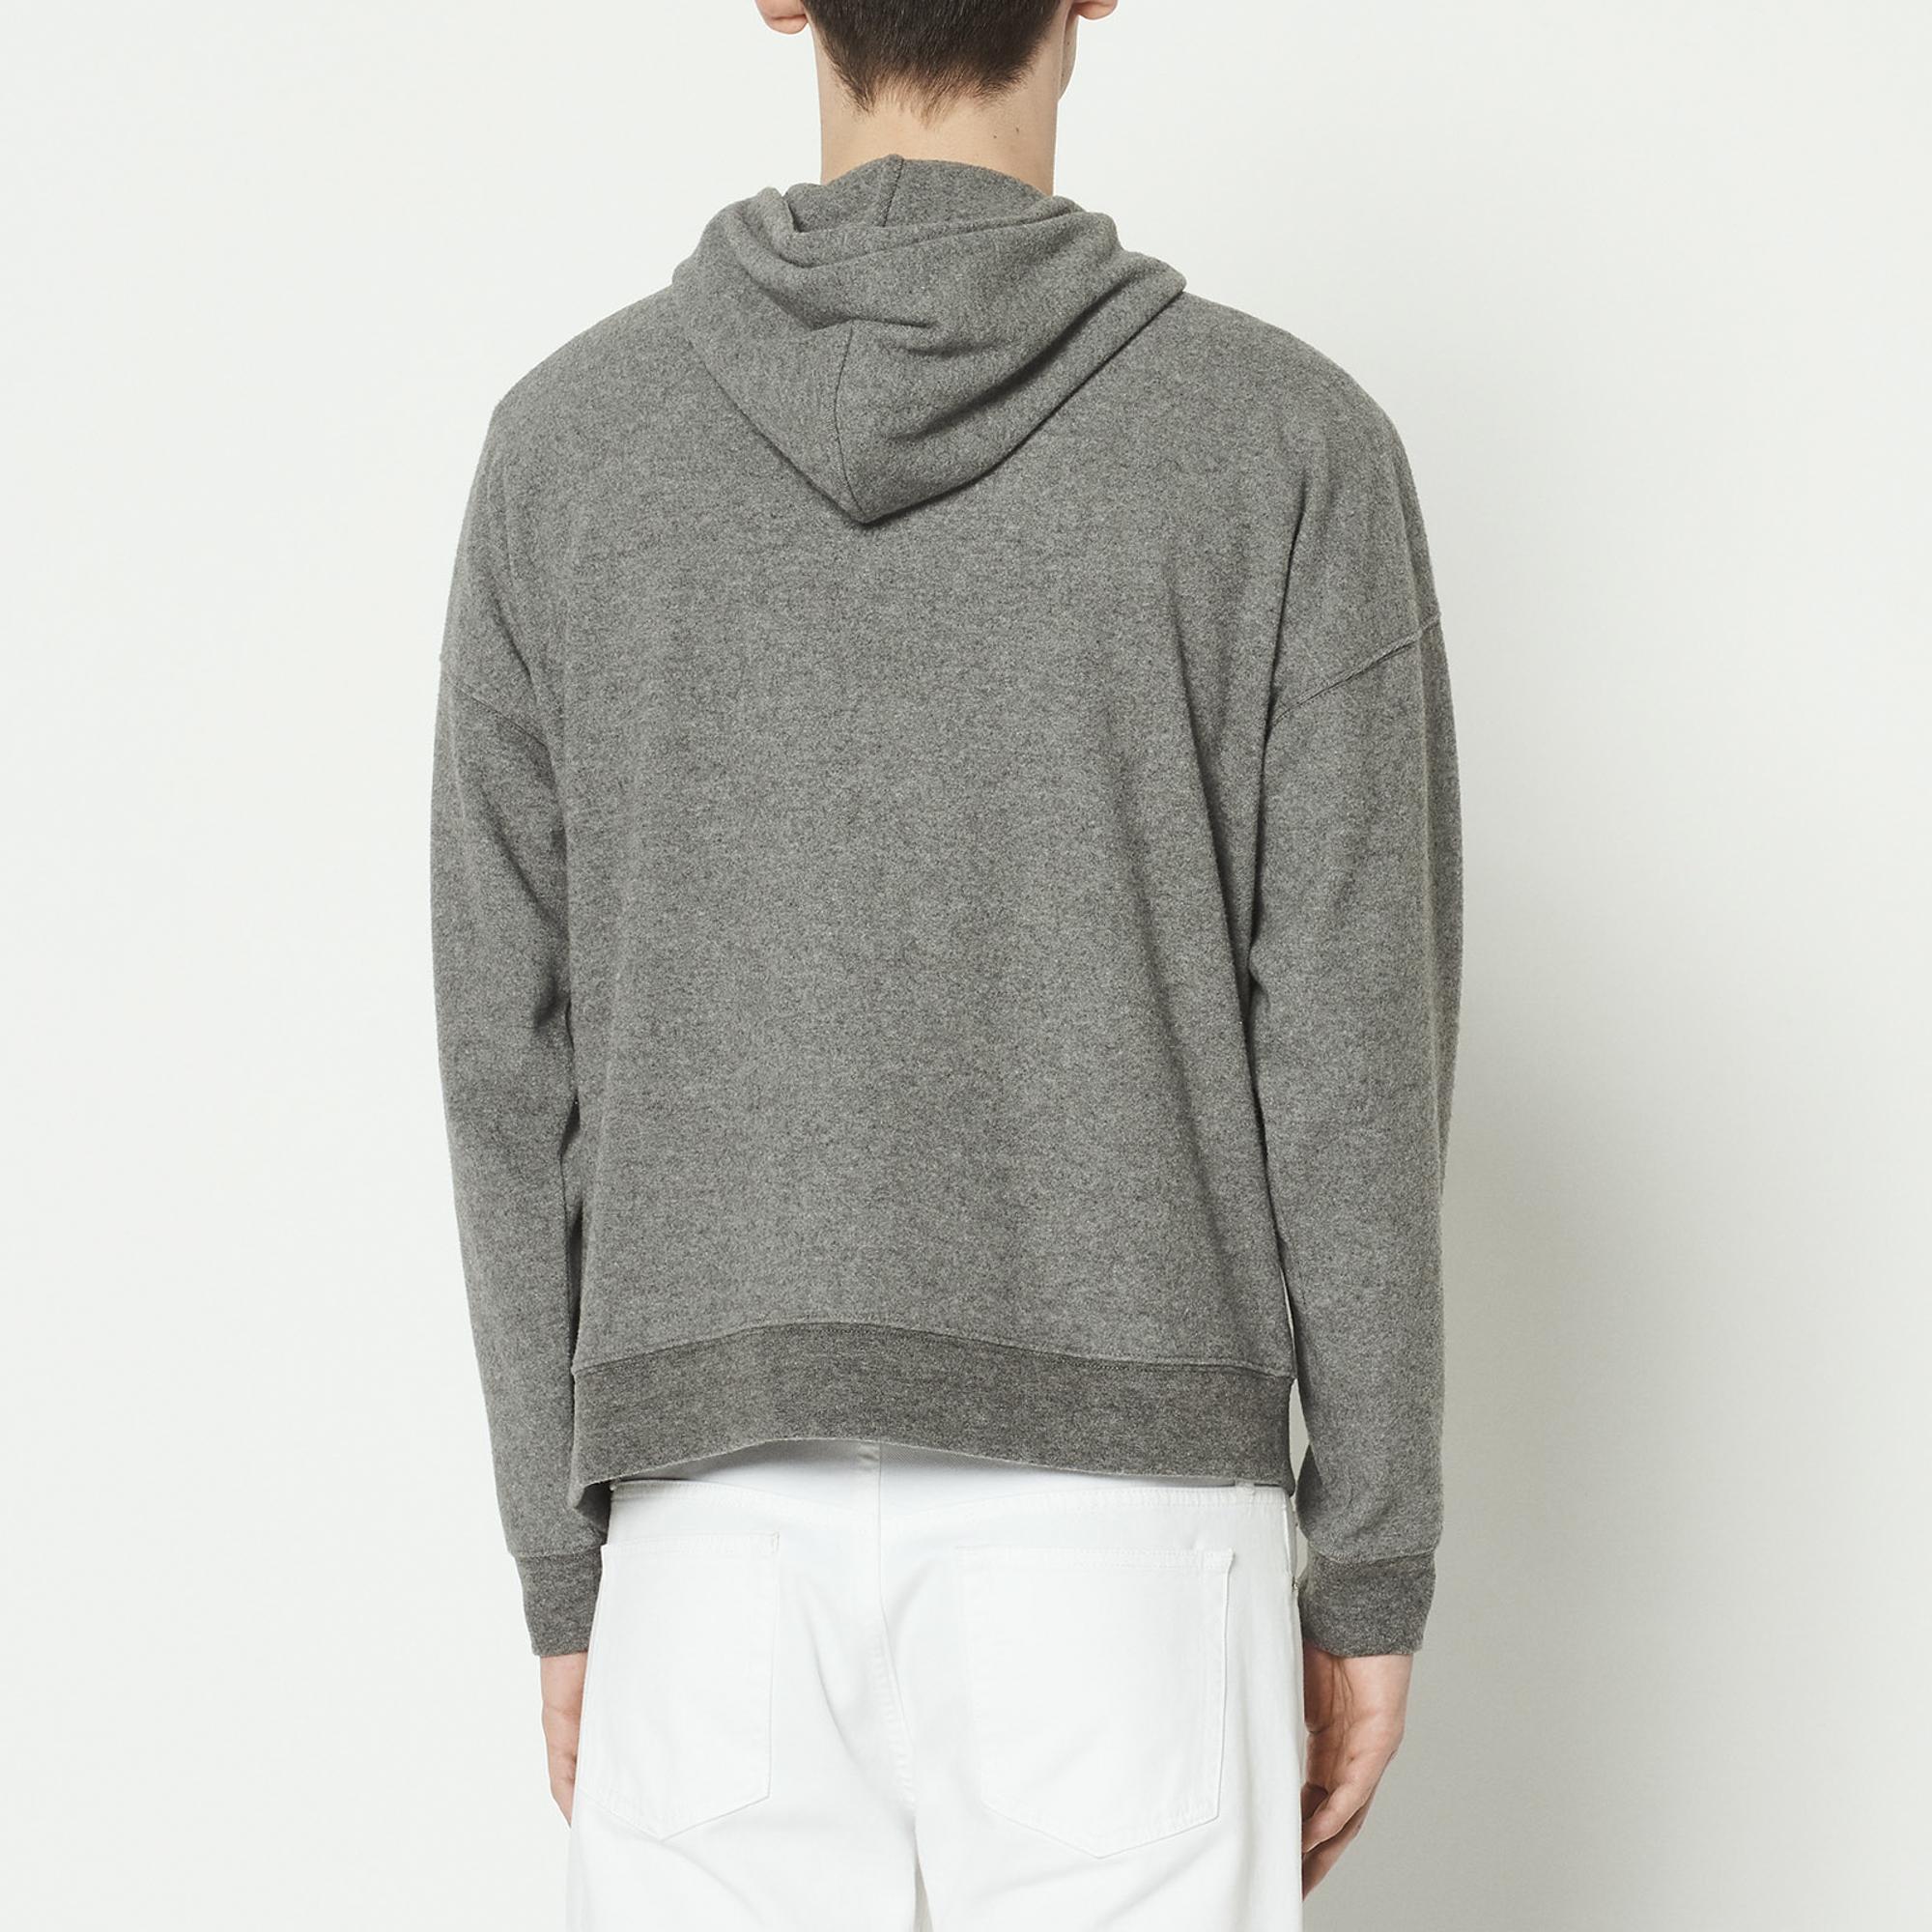 ... Kapuzen-Sweatshirt mit Reißverschluss   Sommerkollektion farbe Grau  Meliert ... 284cde28ec